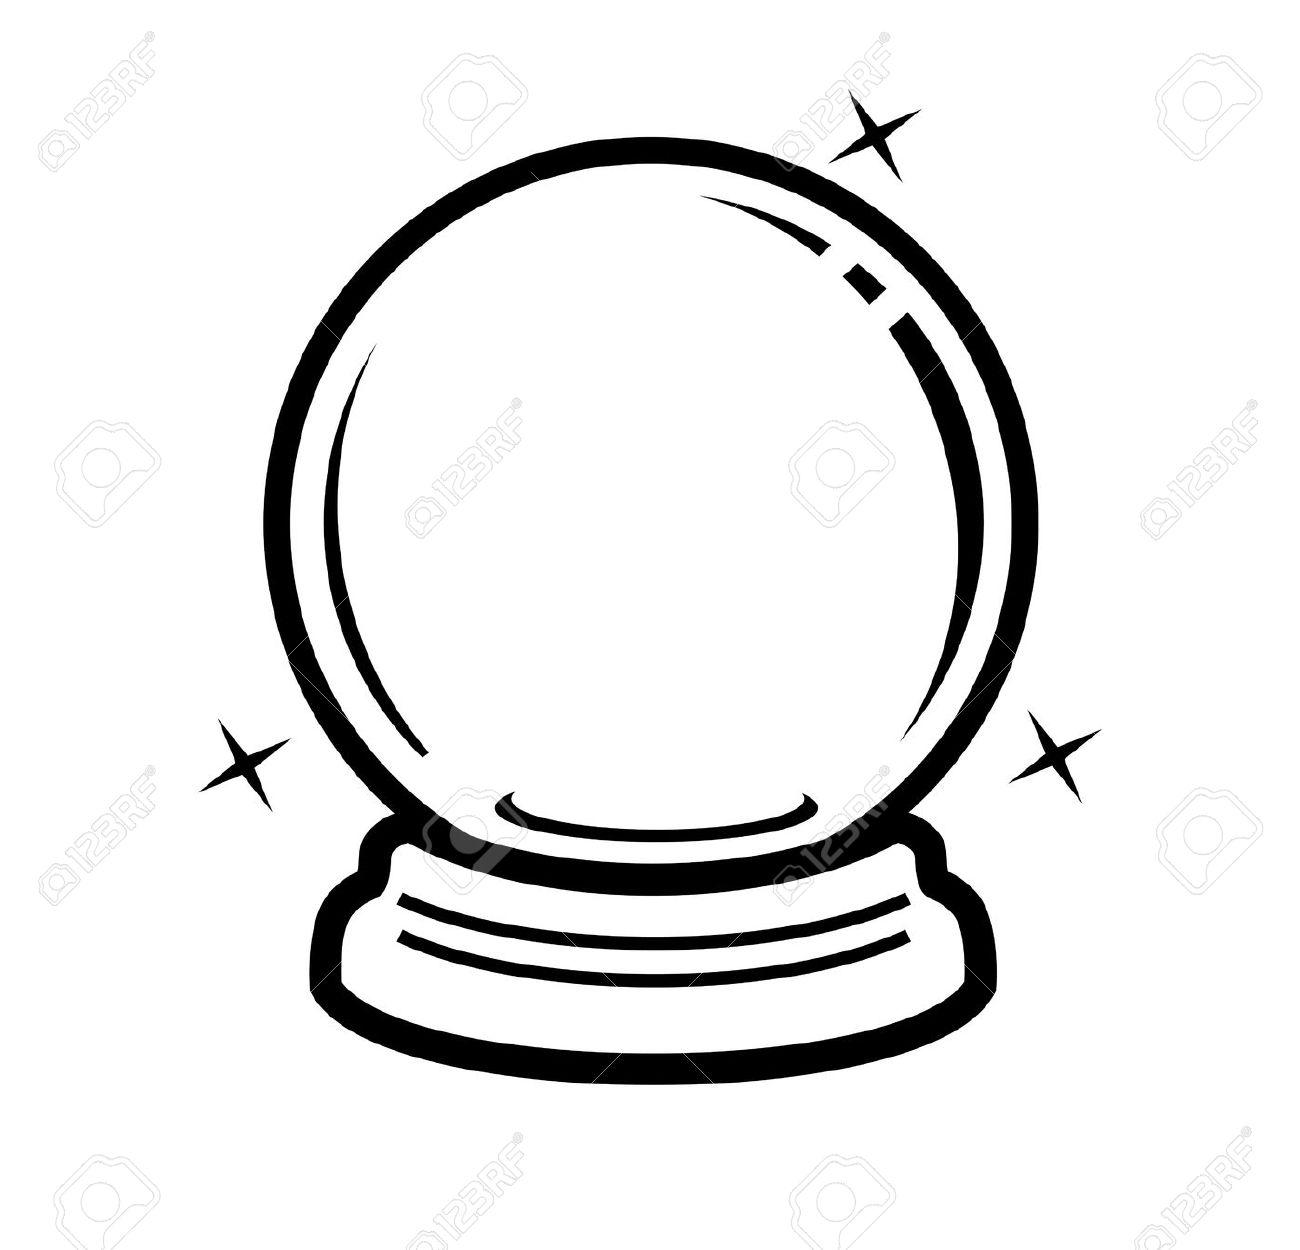 1300x1250 Crystal Ball Clip Art